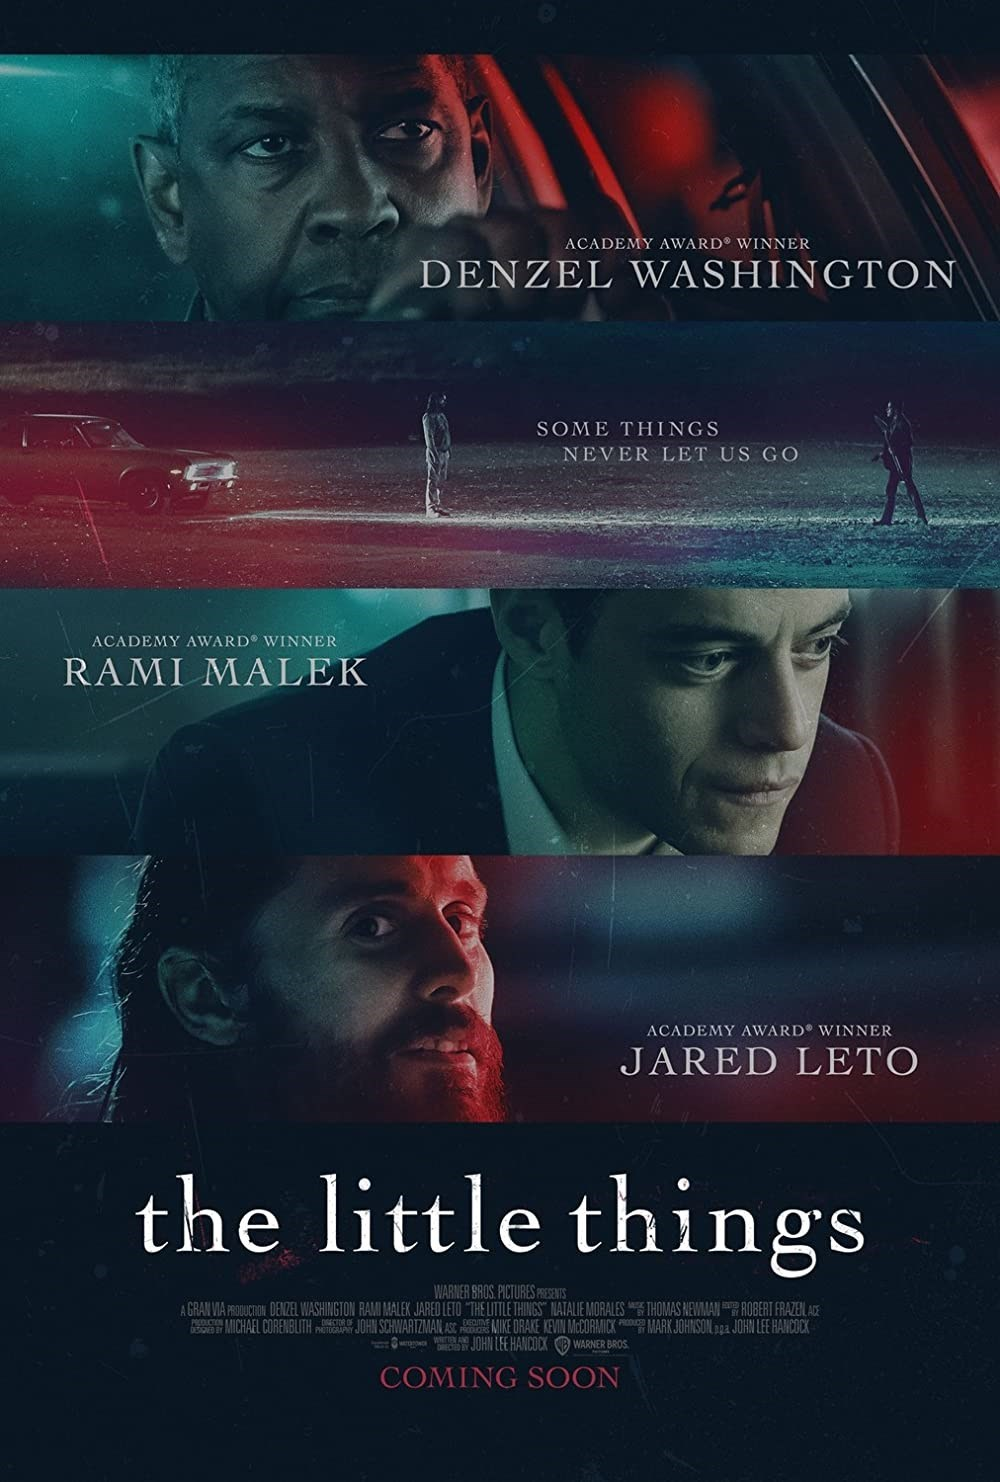 The Little Things (2021) 720p Web-DL PSA NkMUWKXR_o